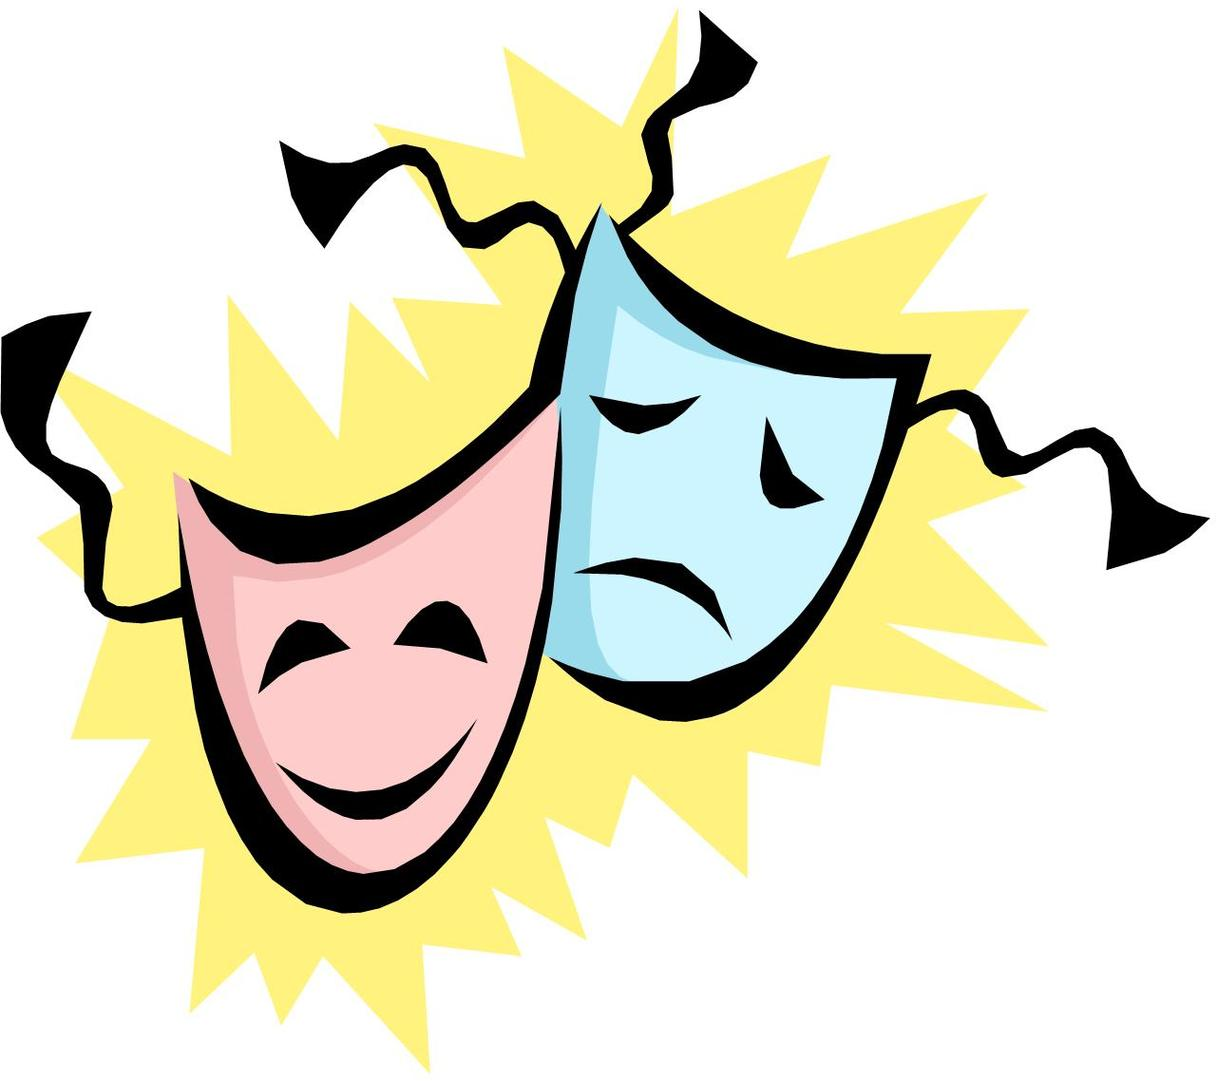 Theatre Mask Clip Art.